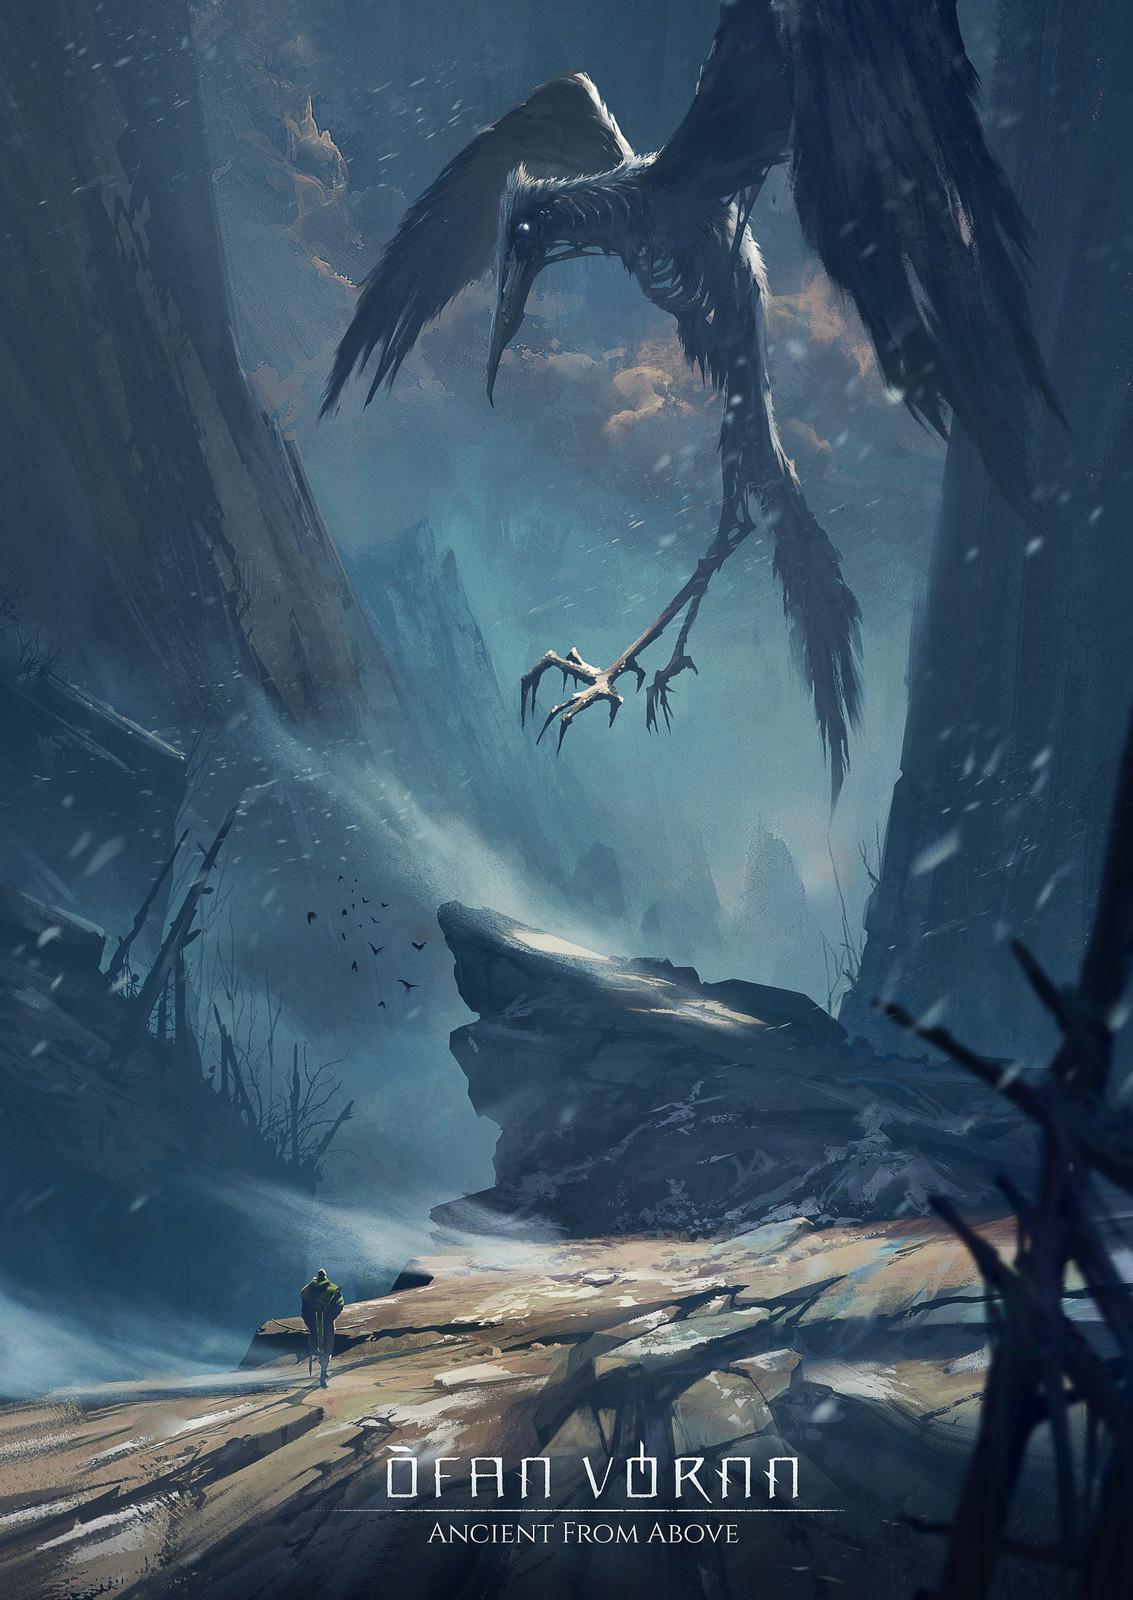 Haven - Ofan Vornn, the Great Crow